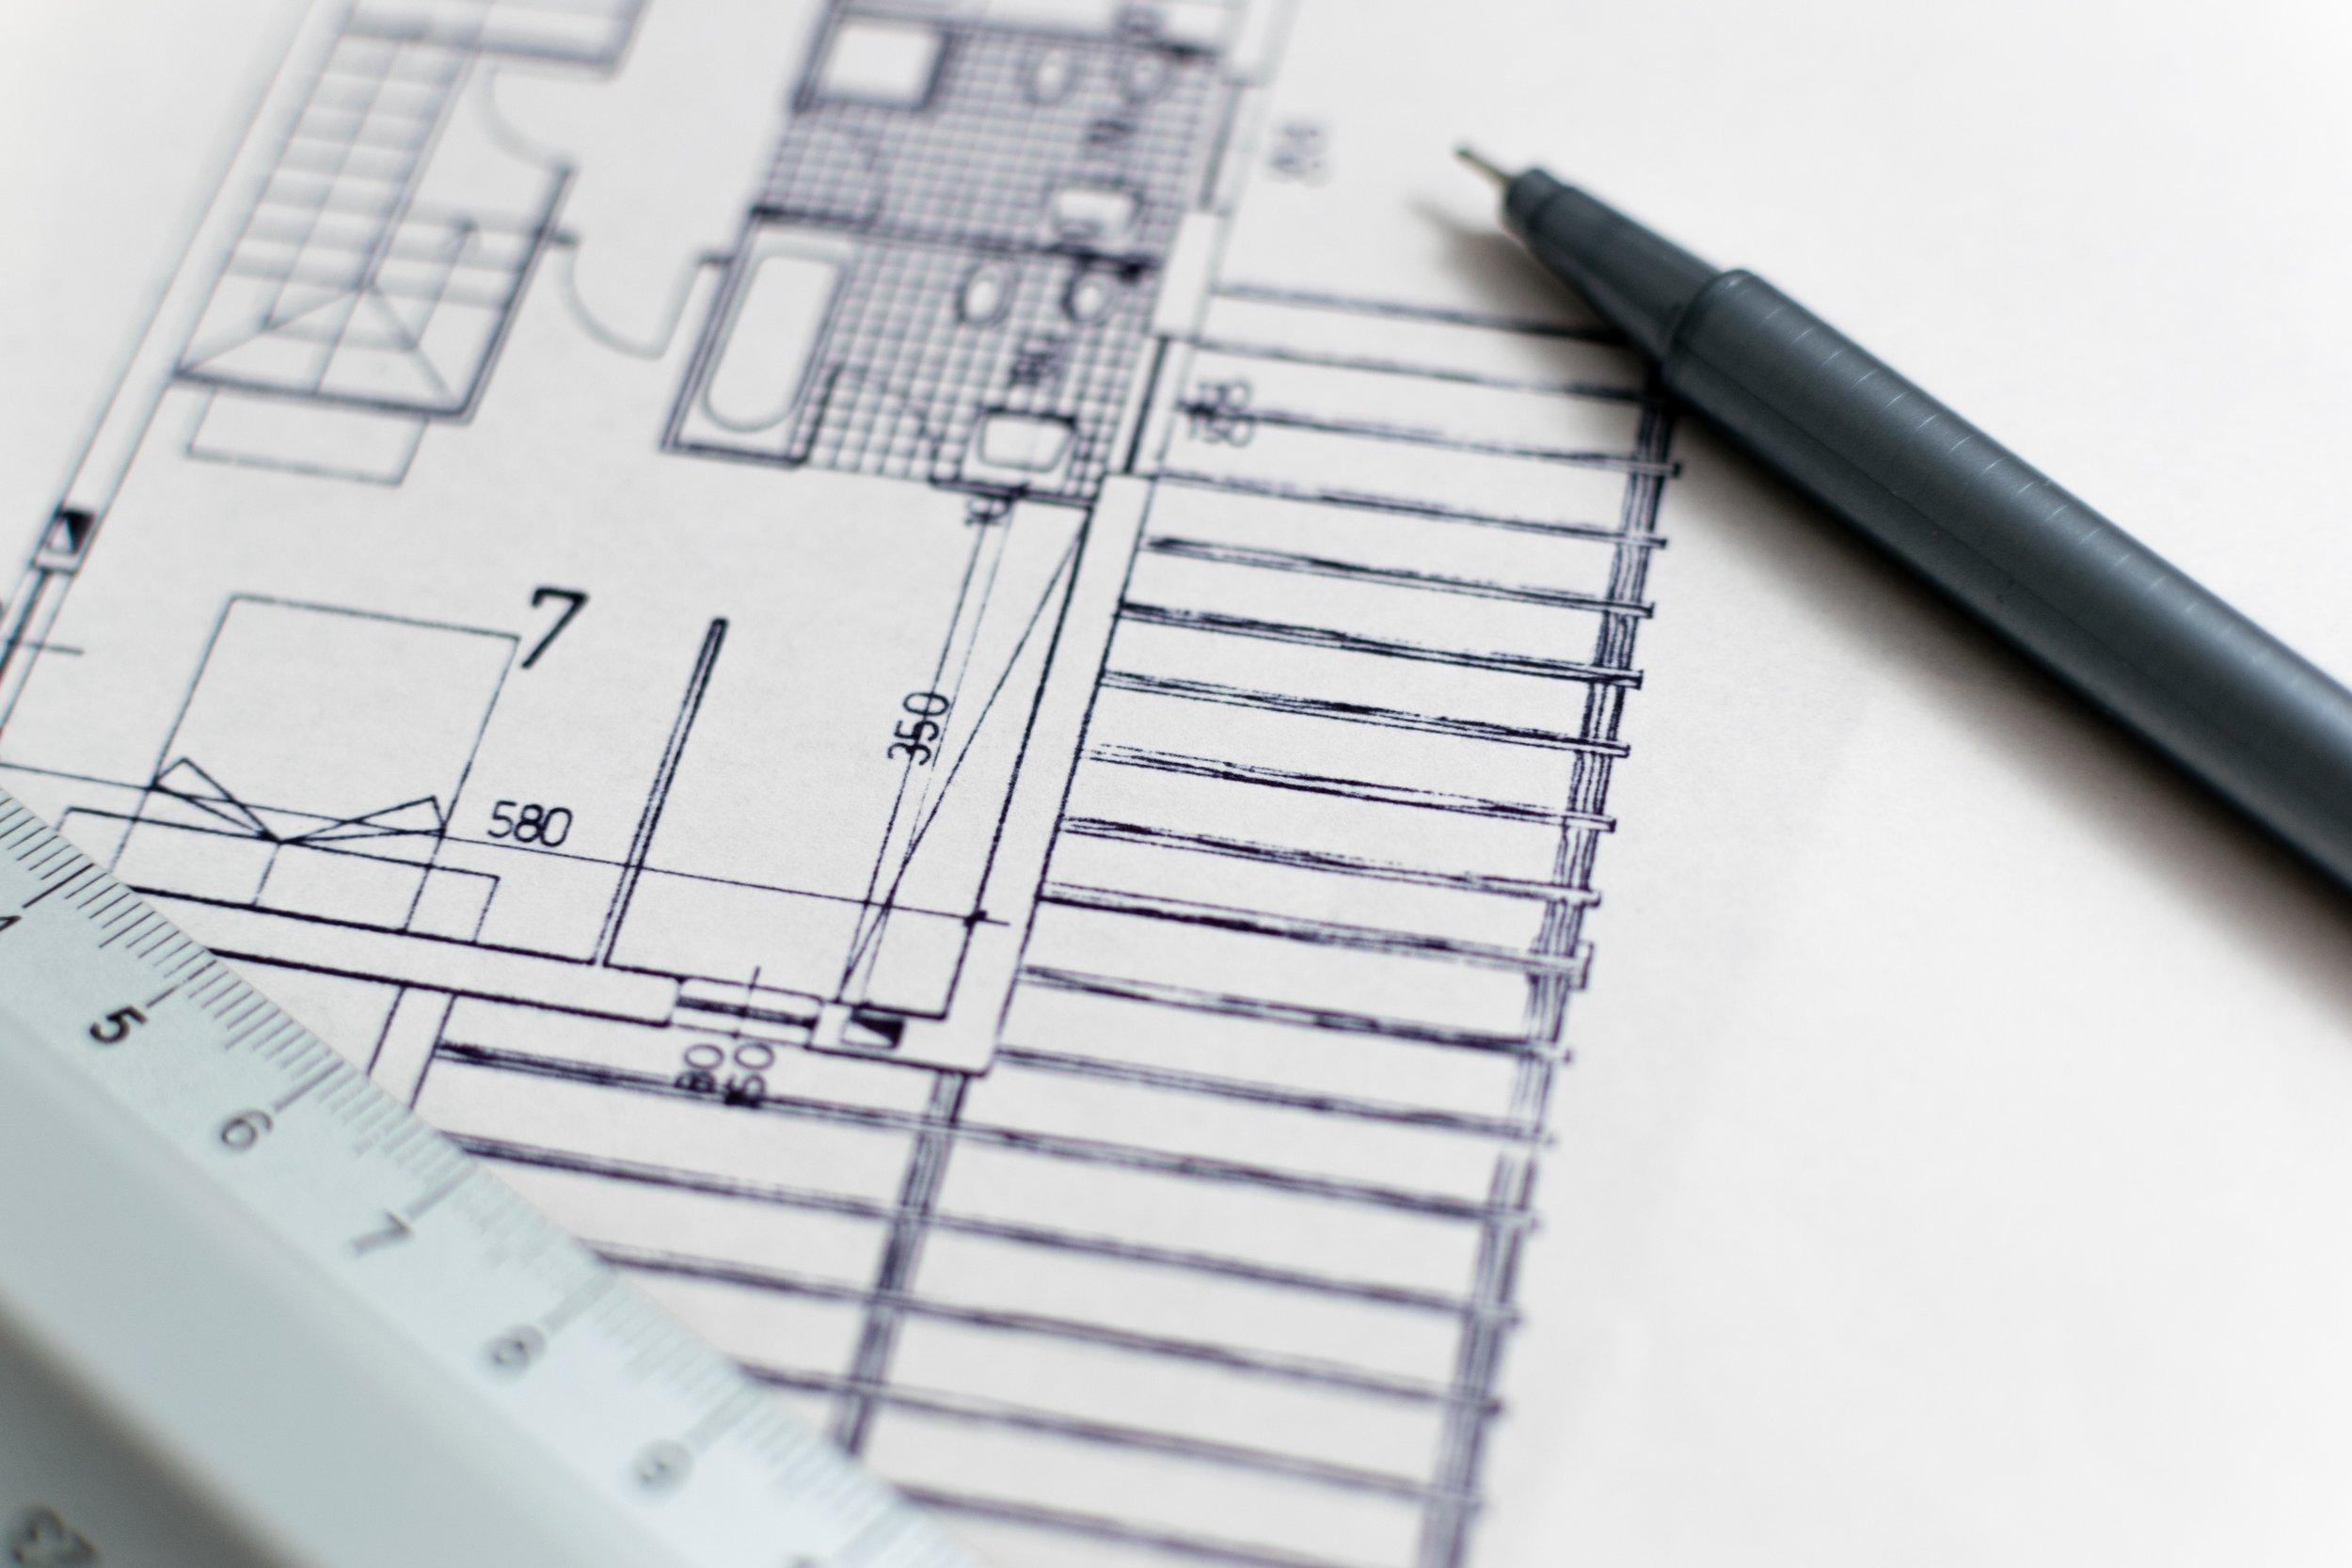 Pre-Design Services - Site AnalysisBuilding Code & Zoning AnalysisExisting Infrastructure AnalysisBudget AnalysisForensic Engineering